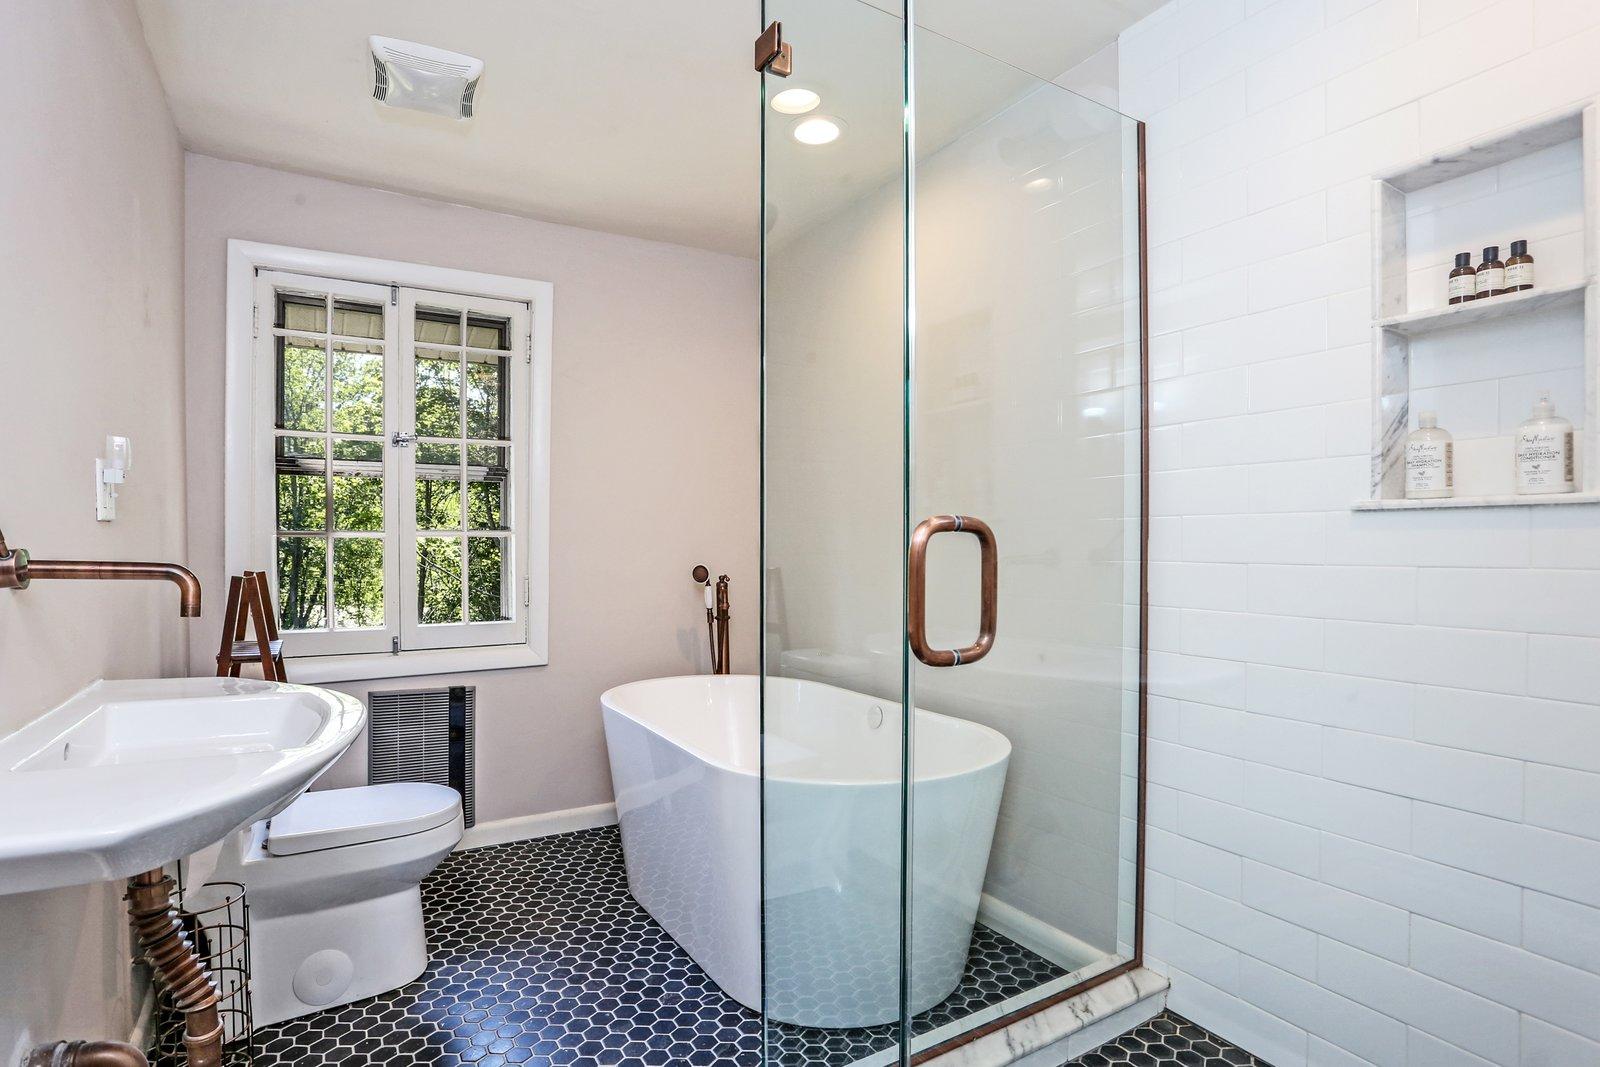 Willow House Putnam New York bathroom